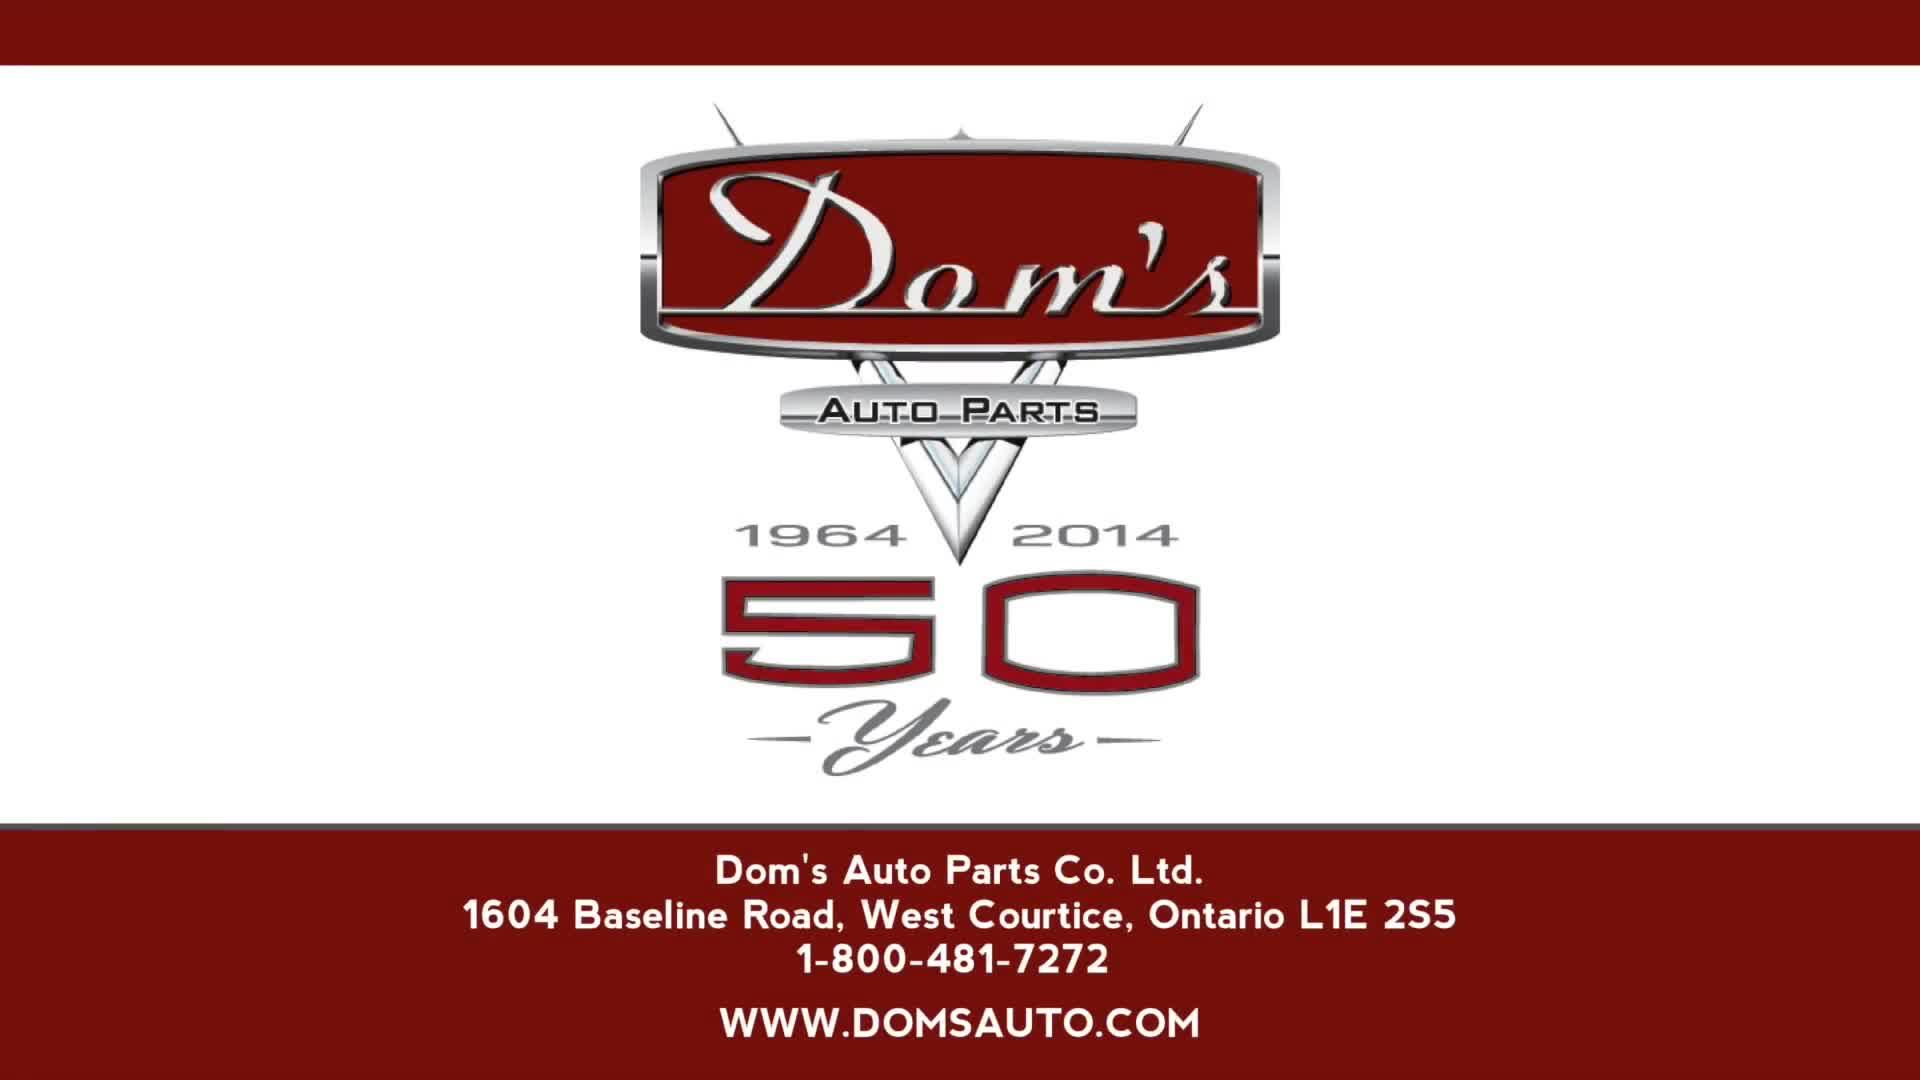 Dom's Auto Parts Co Ltd - Used Auto Parts & Supplies - 905-434-4566